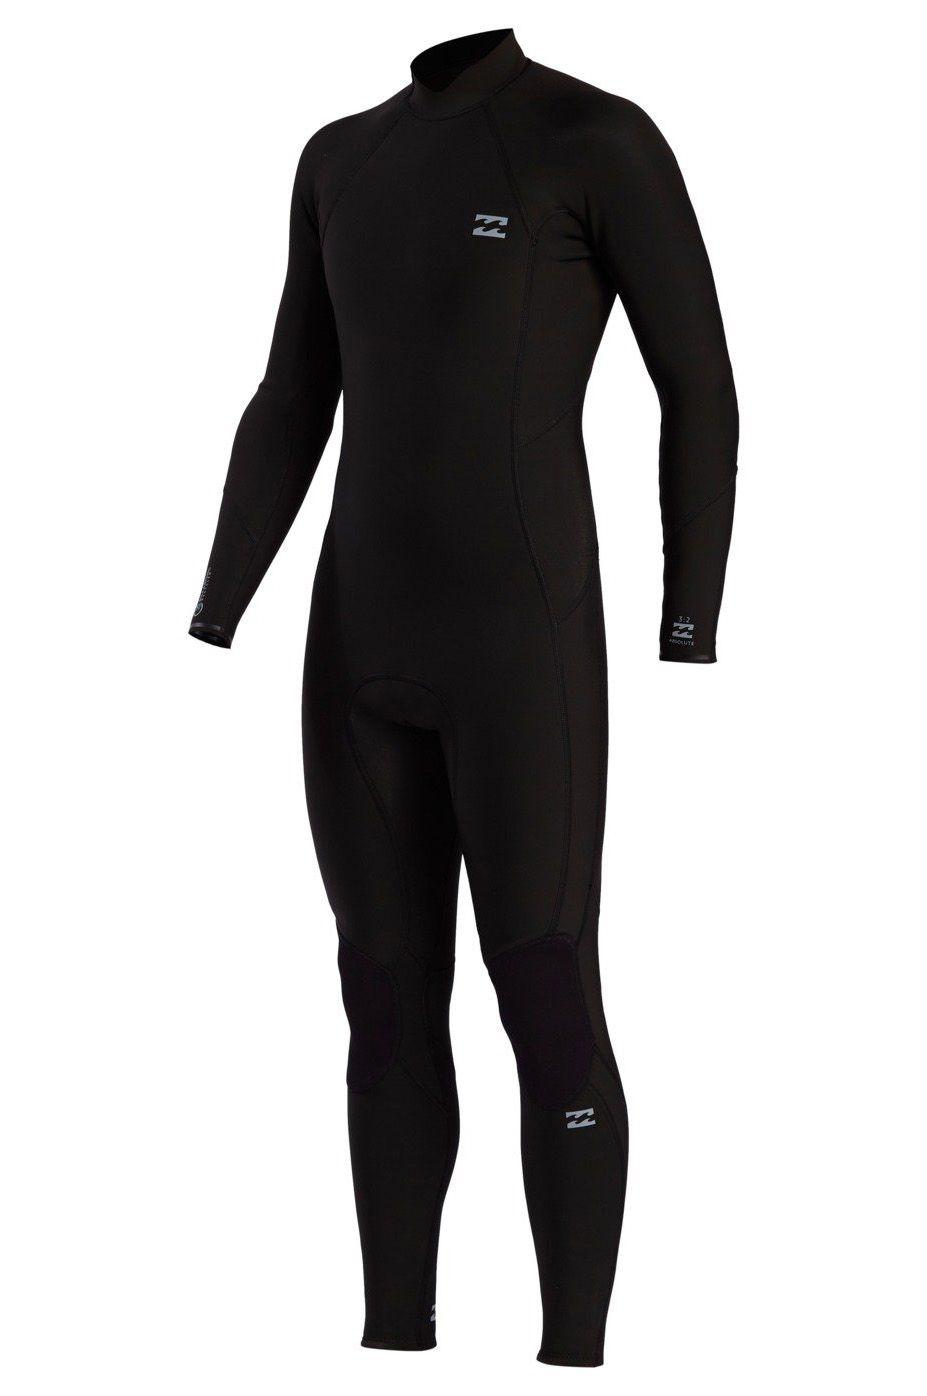 Billabong Wetsuit 302 ABSO BZ FLATLOCK Black 3x2mm